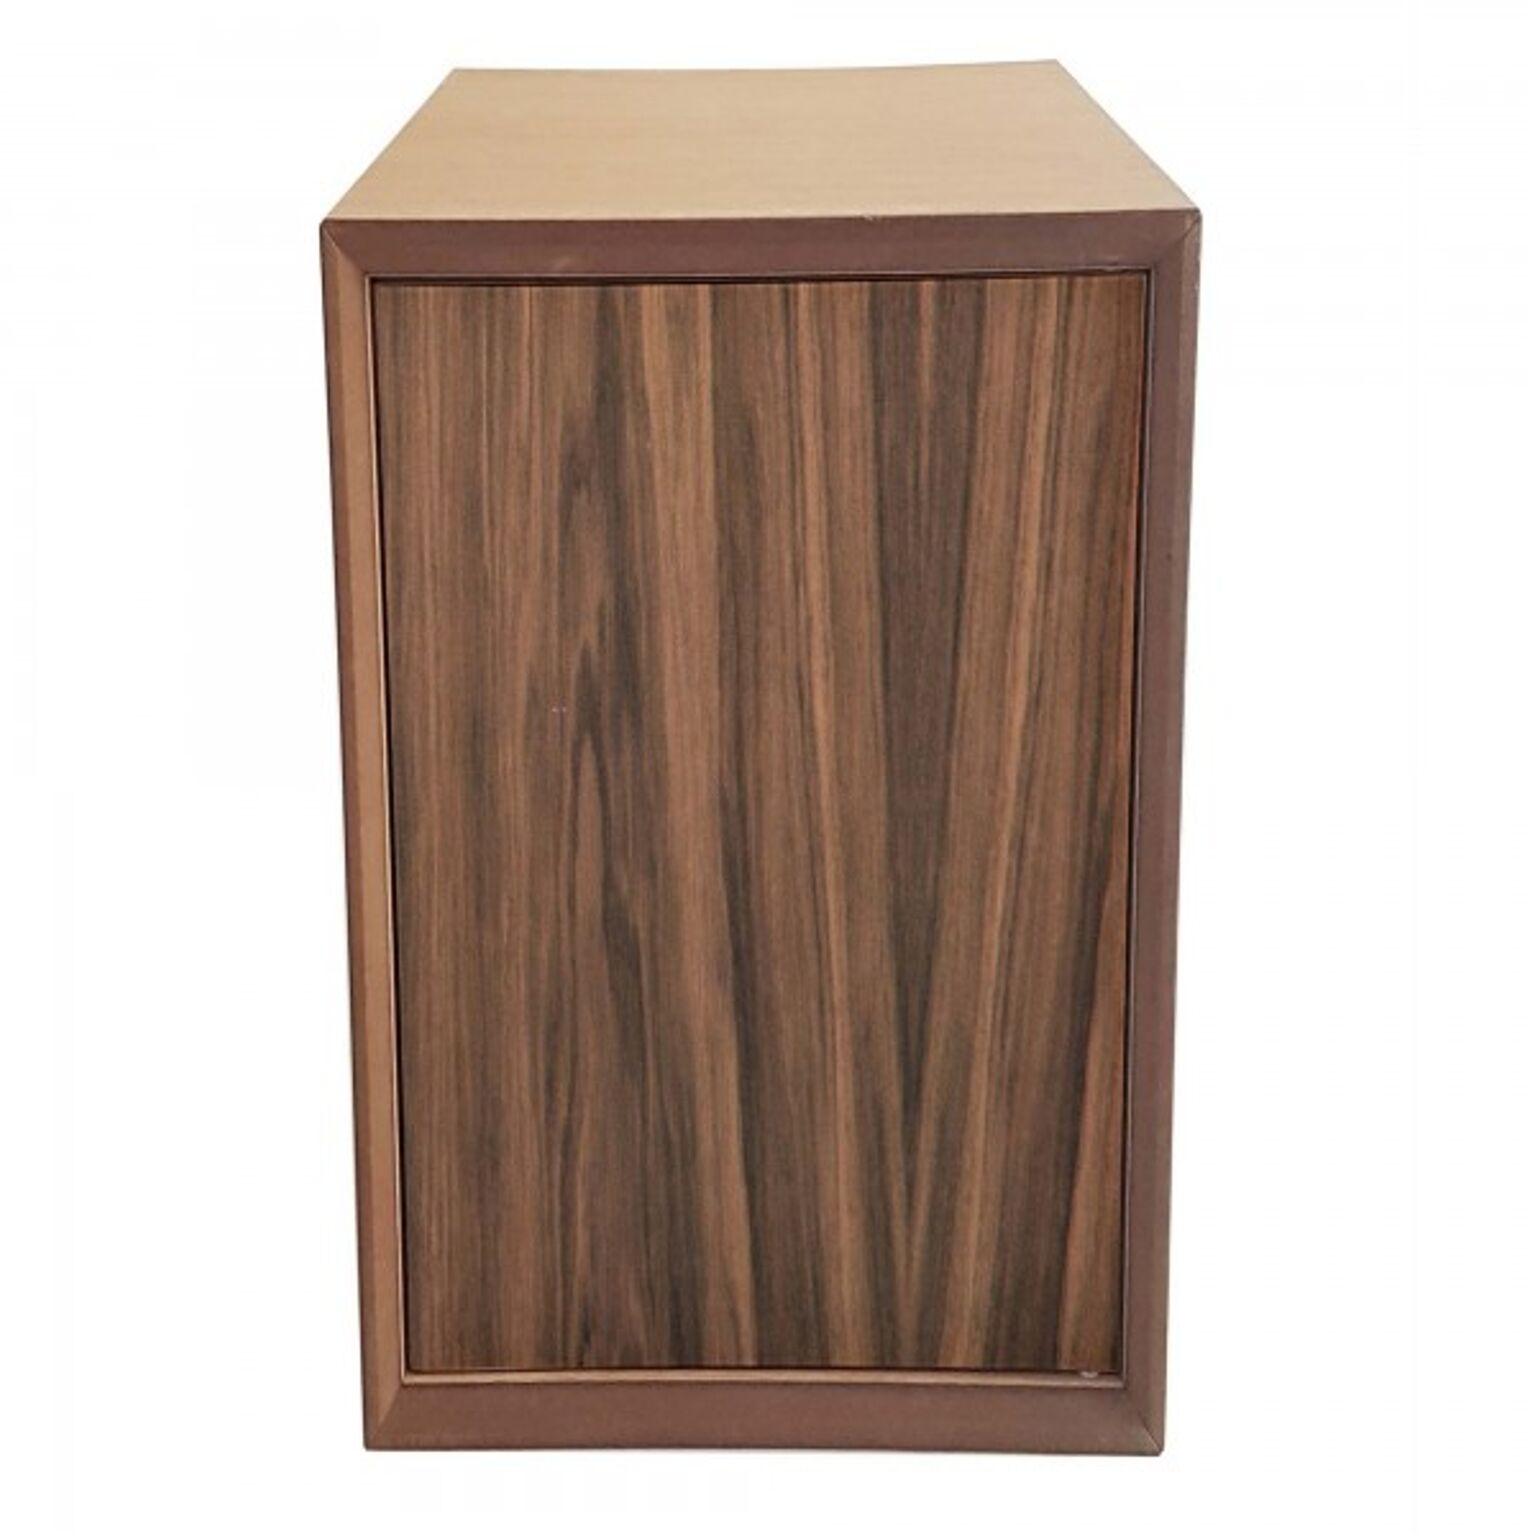 Dulap modular Pixel Wooden l40xA40xH80 cm